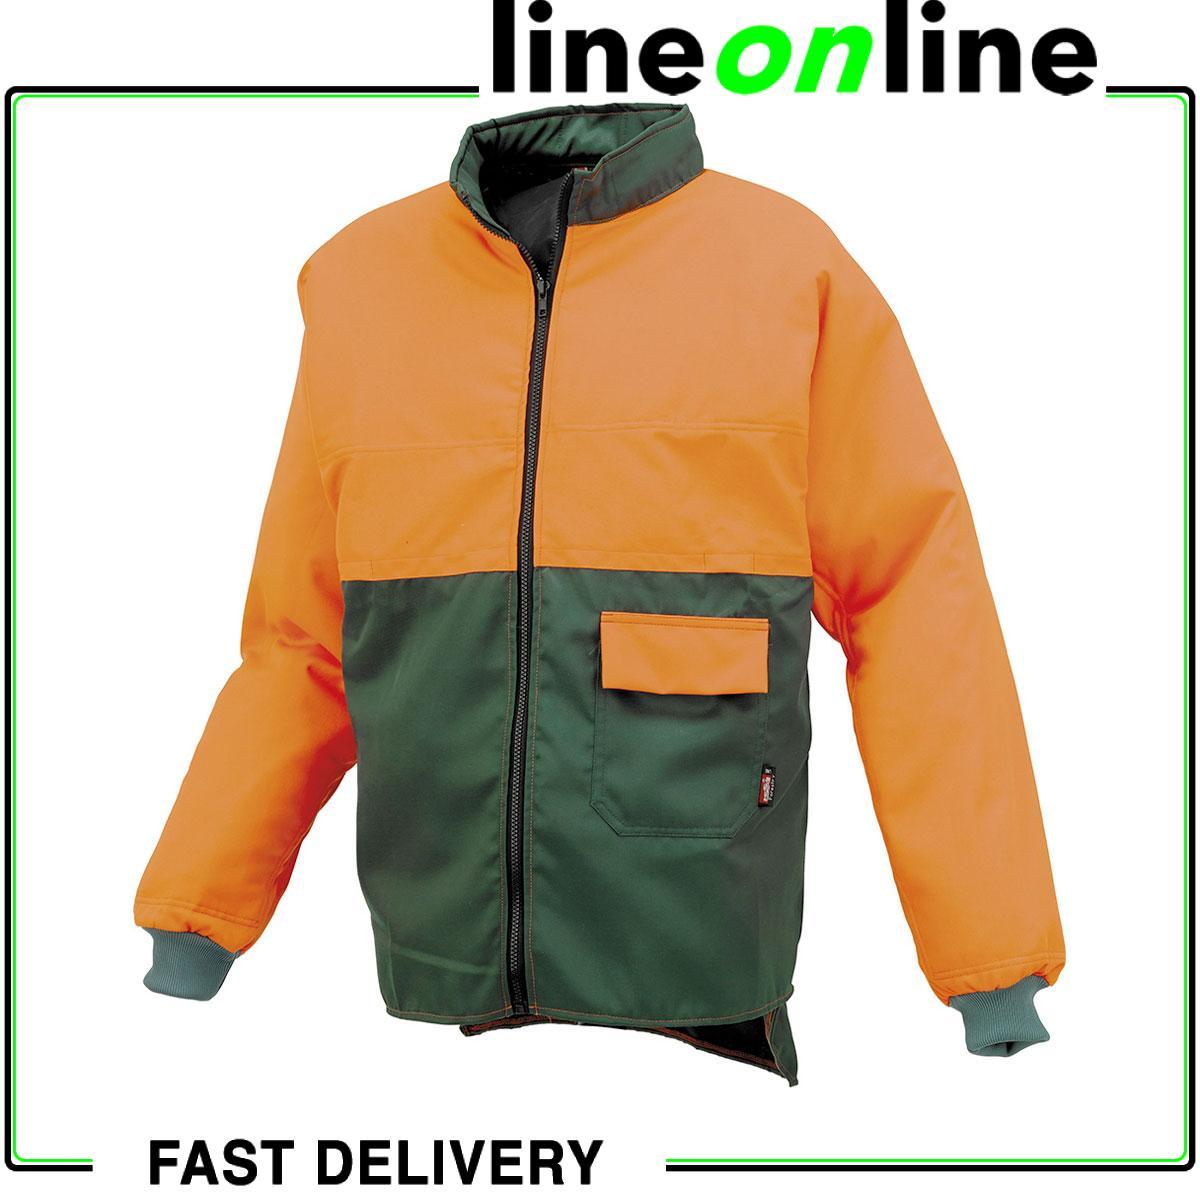 Leñador chaqueta anti-corte Industrial Estrellater 08950N